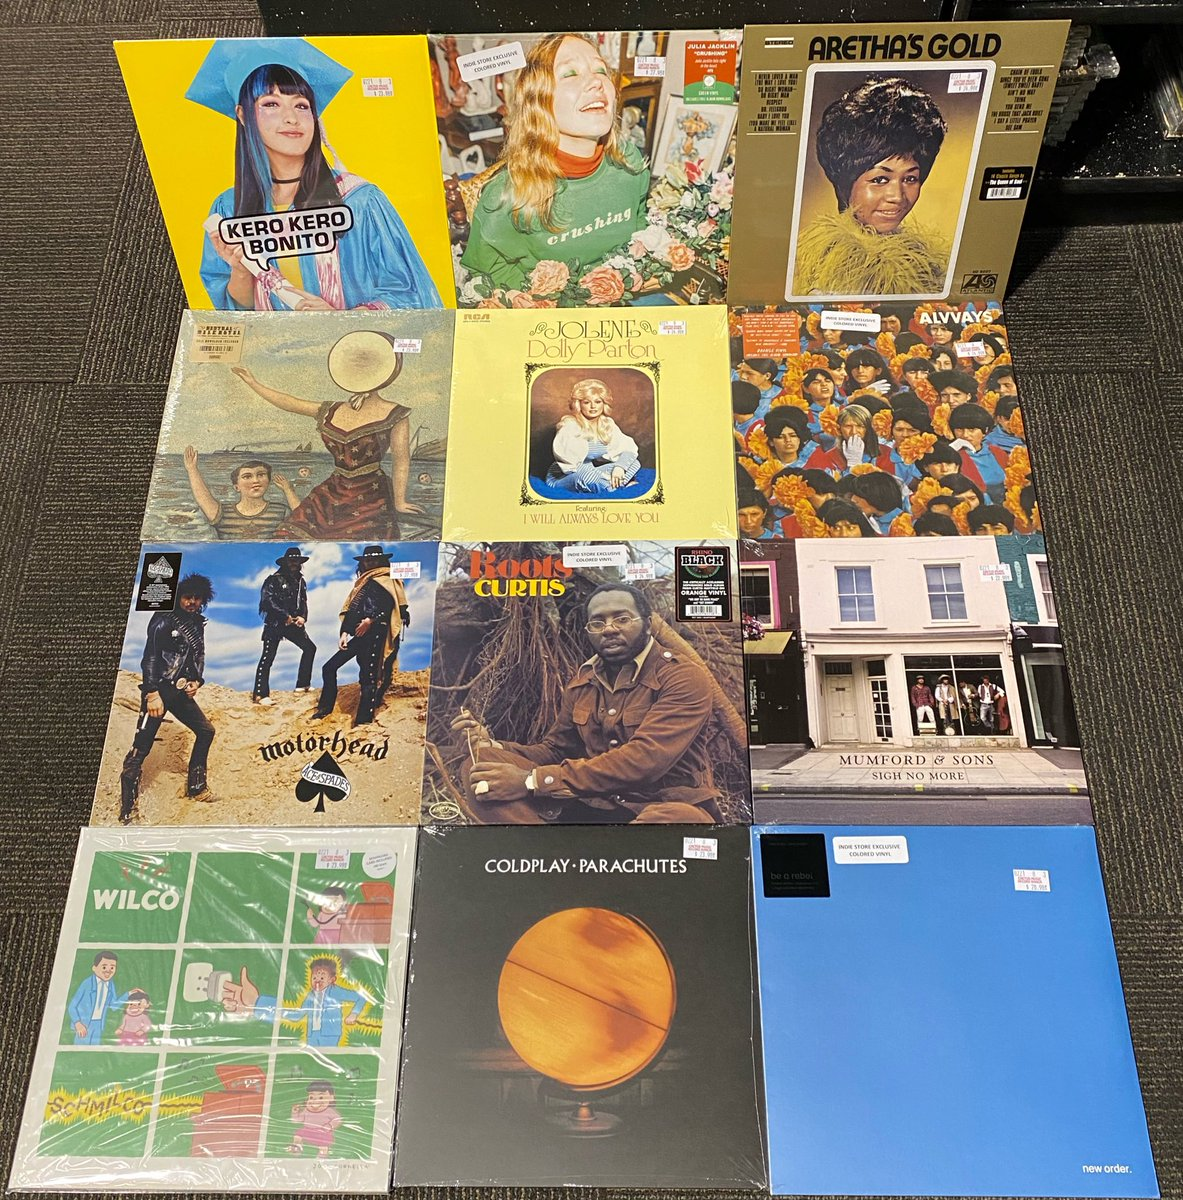 "Small sampling of recent vinyl restocks! Don't see something in-stock? Be sure to check back for ""daily-ish"" restocks or new arrivals. #TheBlackKeys #KateBush #Coldplay #ArethaFranklin #KeroKeroBonito #Lizzo #NeutralMilkHotel #DollyParton #TeganAndSara ⠀⠀⠀⠀⠀⠀⠀⠀⠀⠀⠀"